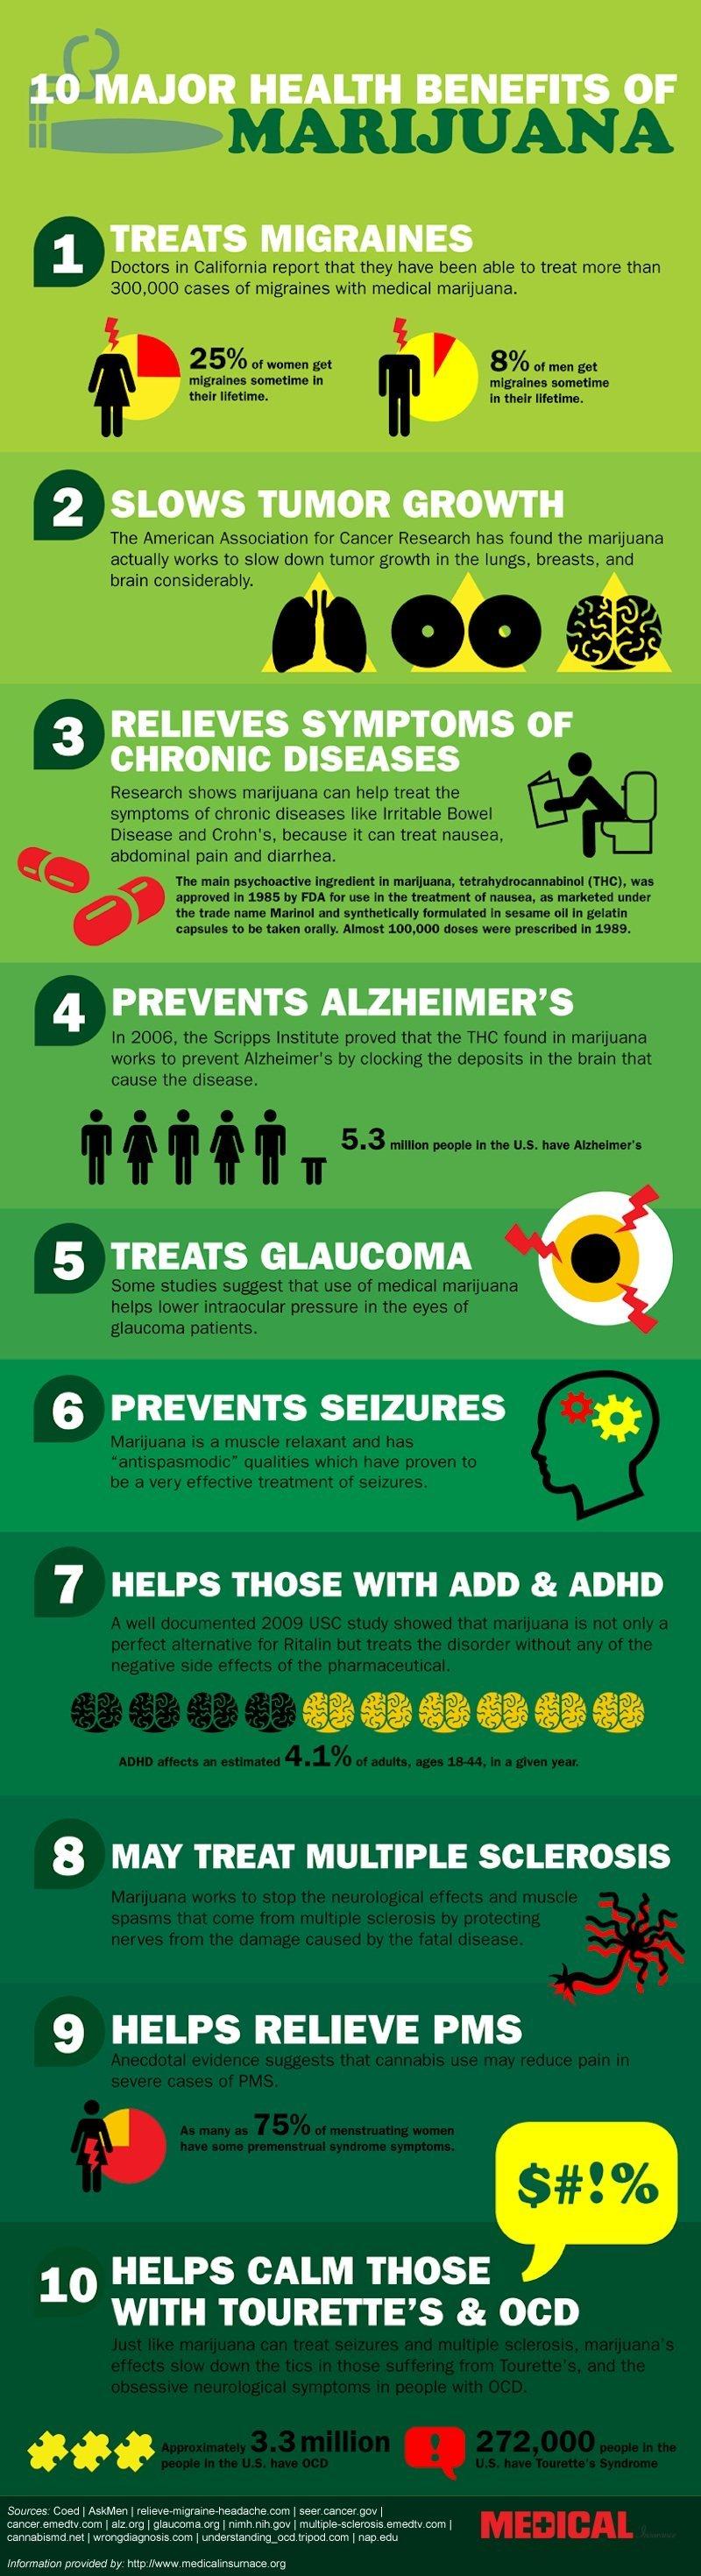 Cool Stuff: For Health Benefits